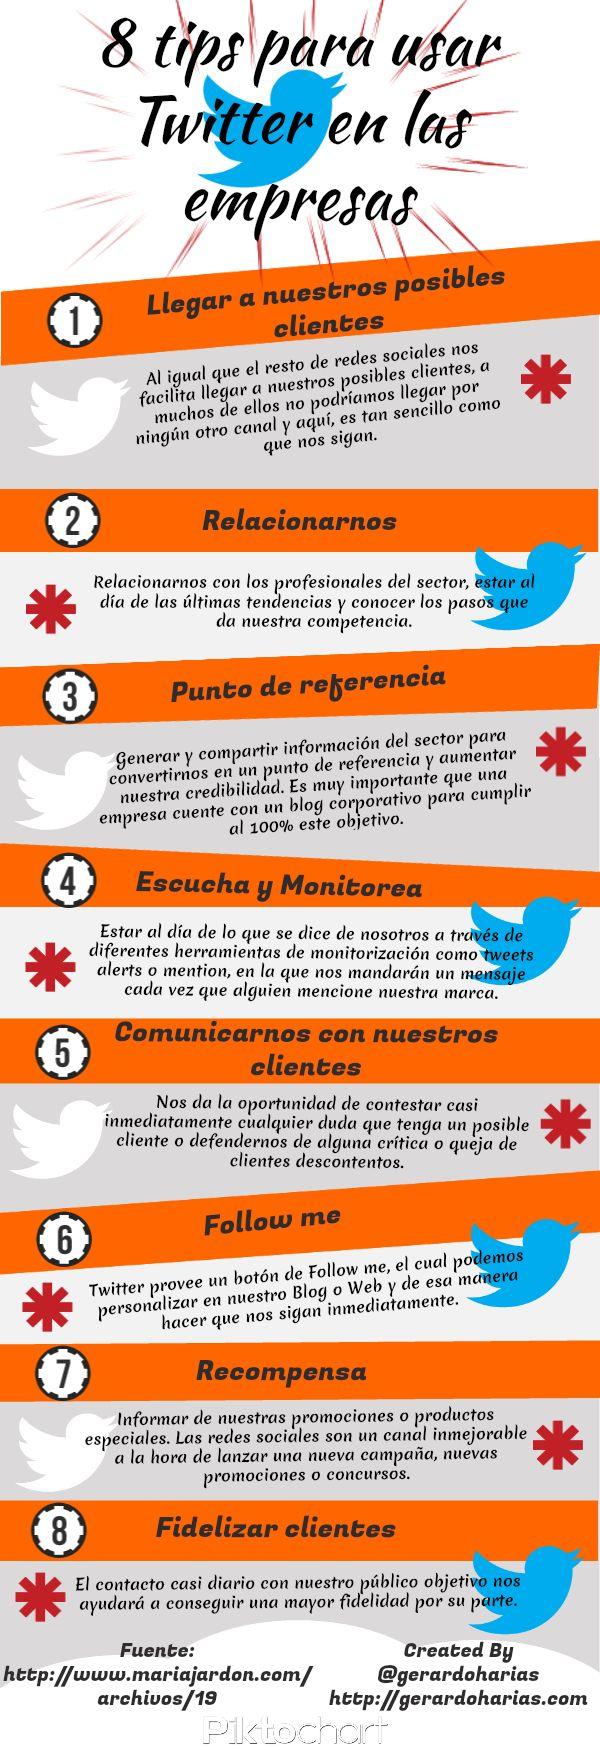 8 consejos para usar Twitter en las empresas #infografia #infographic #socialmedia